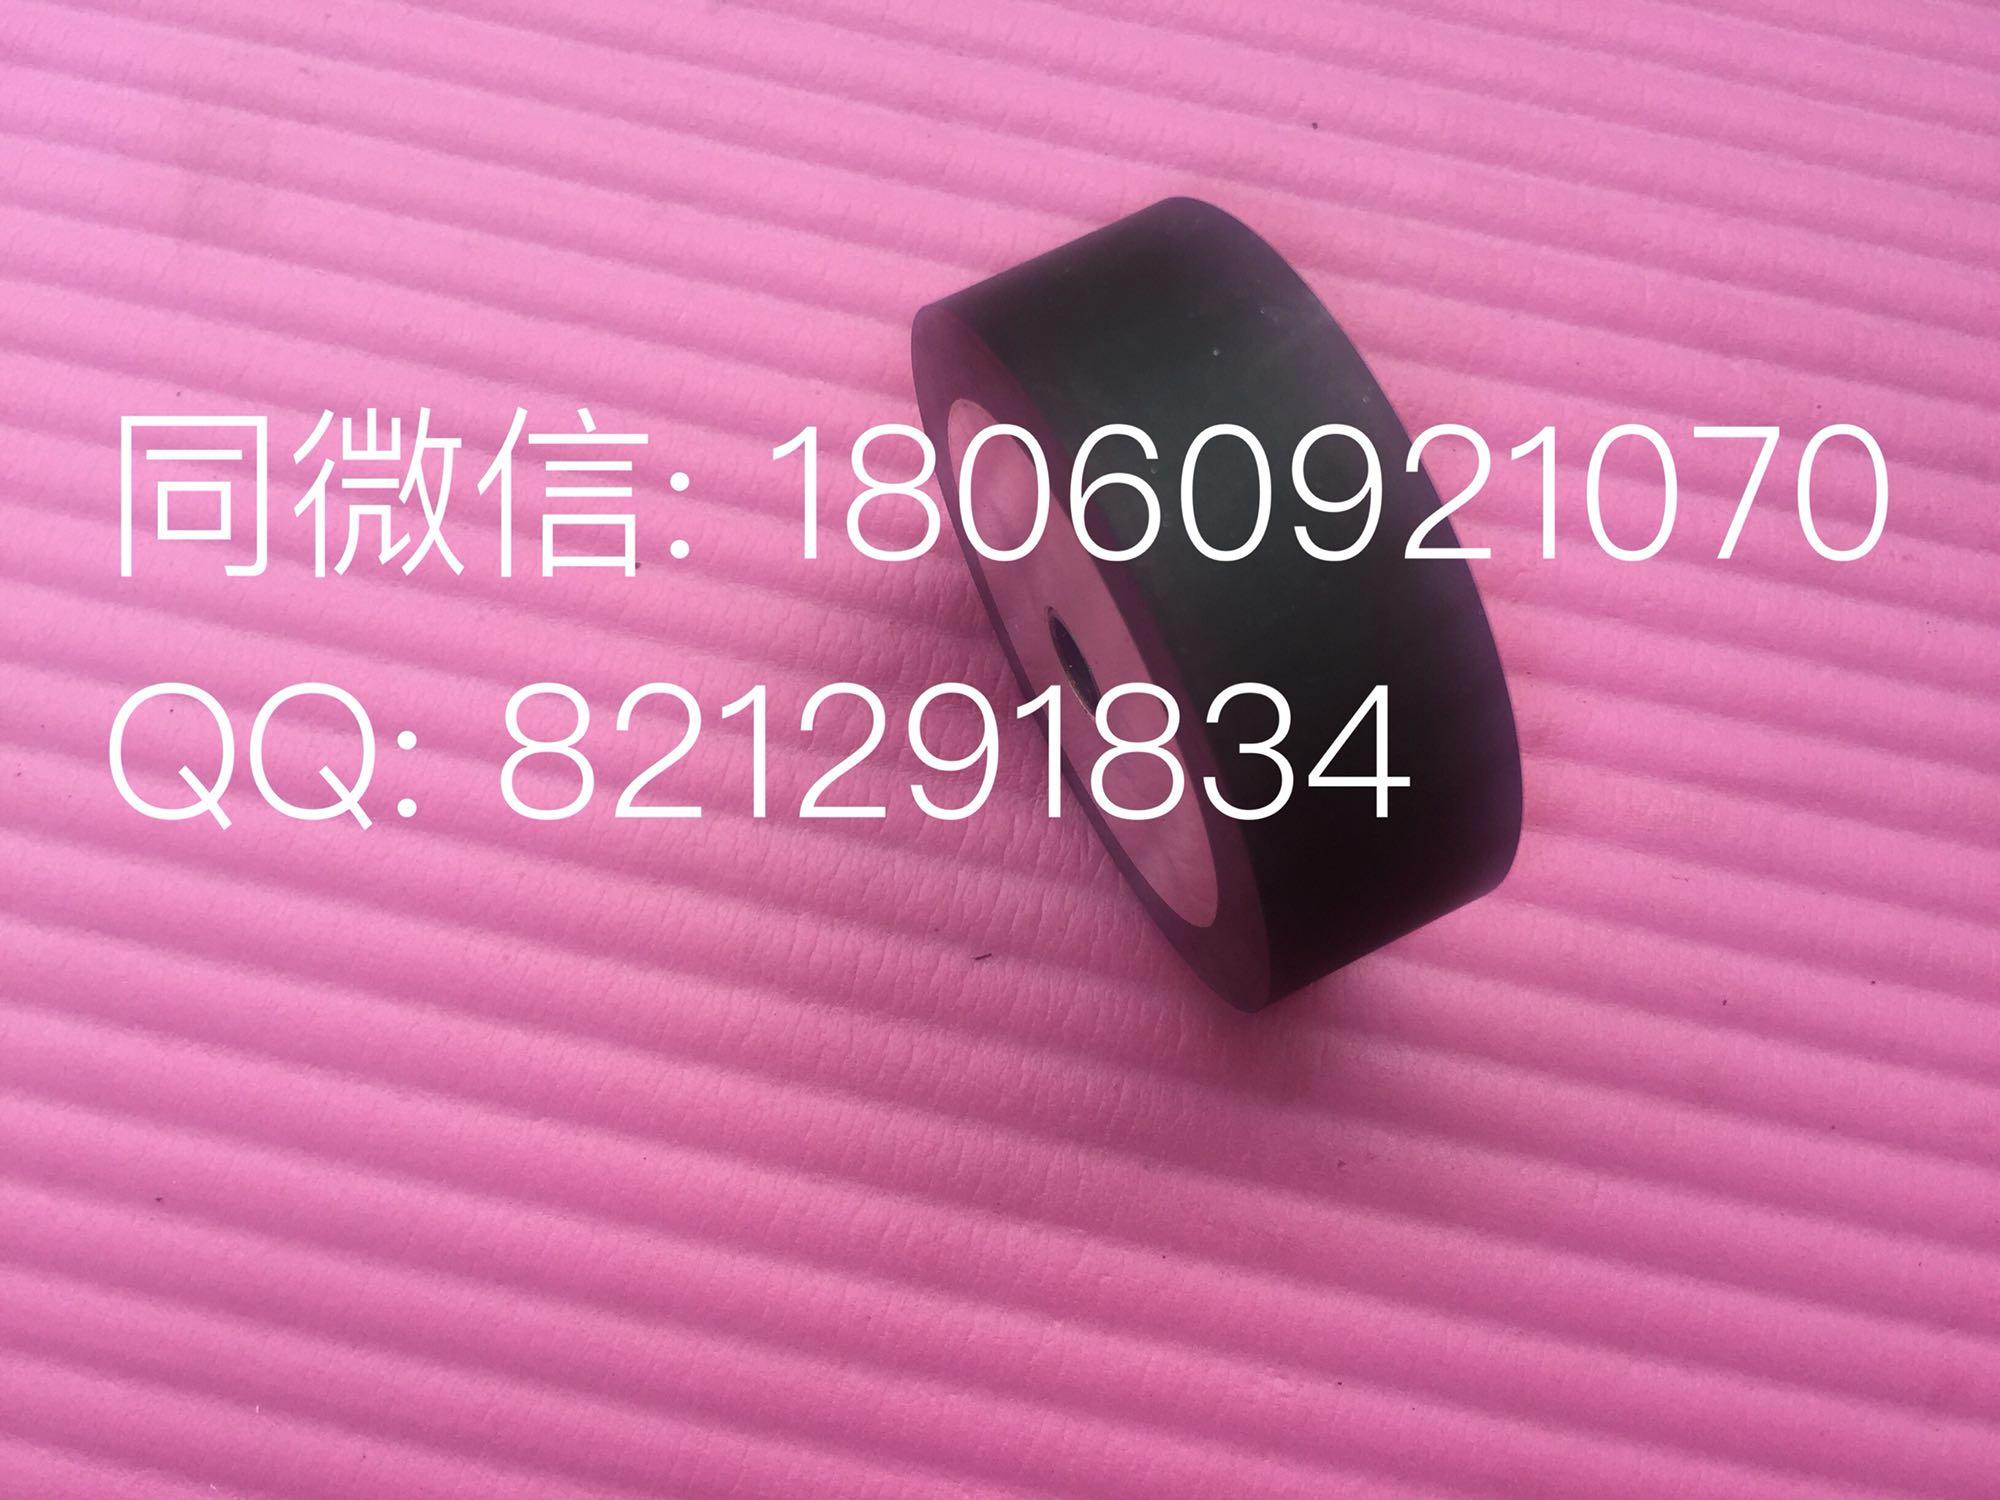 1 piece Printing machine glue wheel, pressure roller wheel, printing rubber wheel